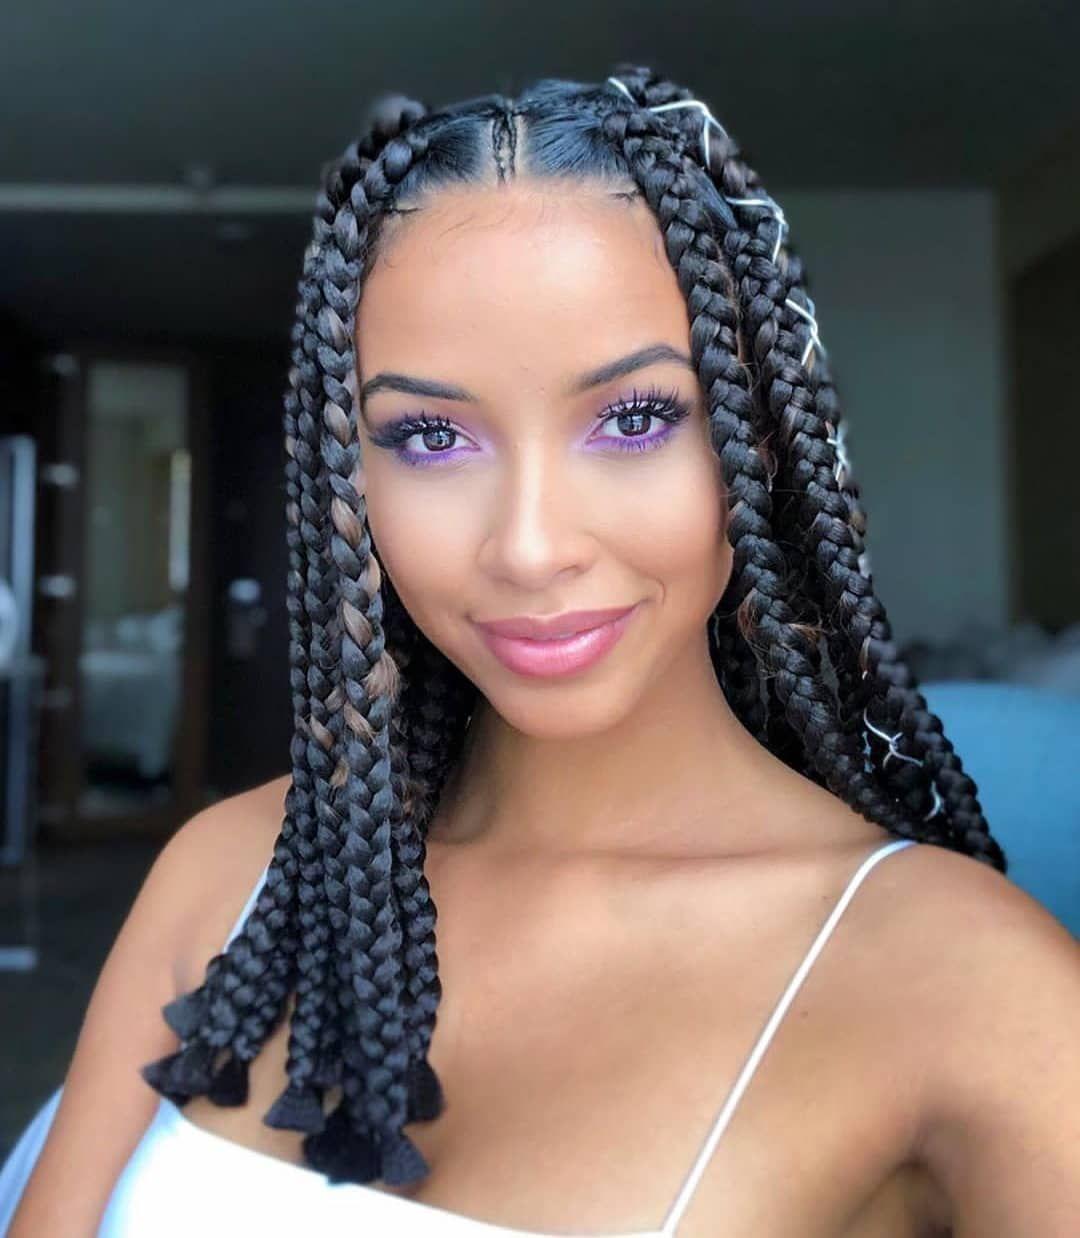 Lob Hair Prom Hairstyles Cute Hairstyles Hair Scrunchie Winterformal Hair In 2020 Box Braids Hairstyles For Black Women Box Braids Hairstyles Bob Braids Hairstyles